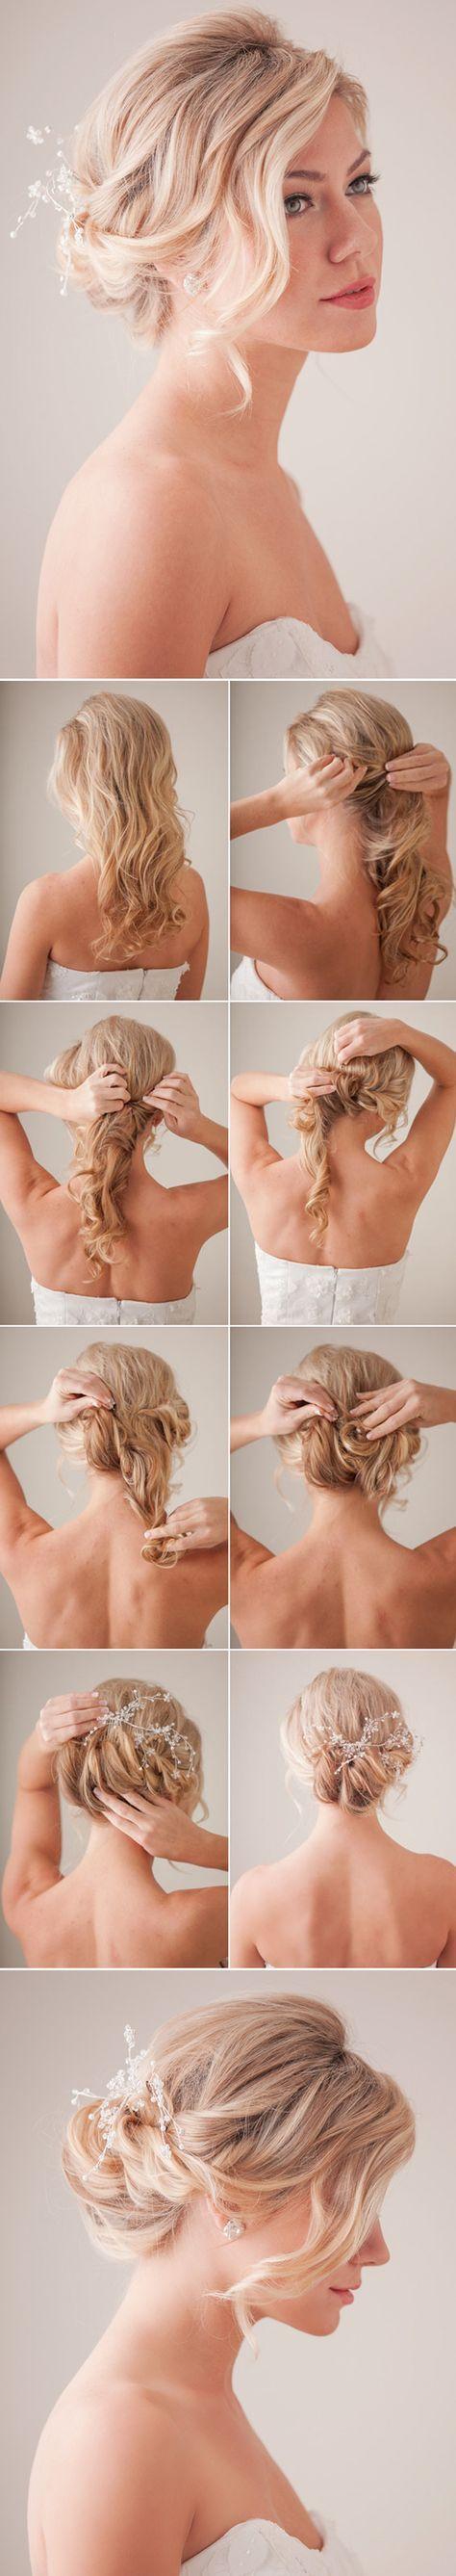 DIY curly bridal updo wedidng hairstyle